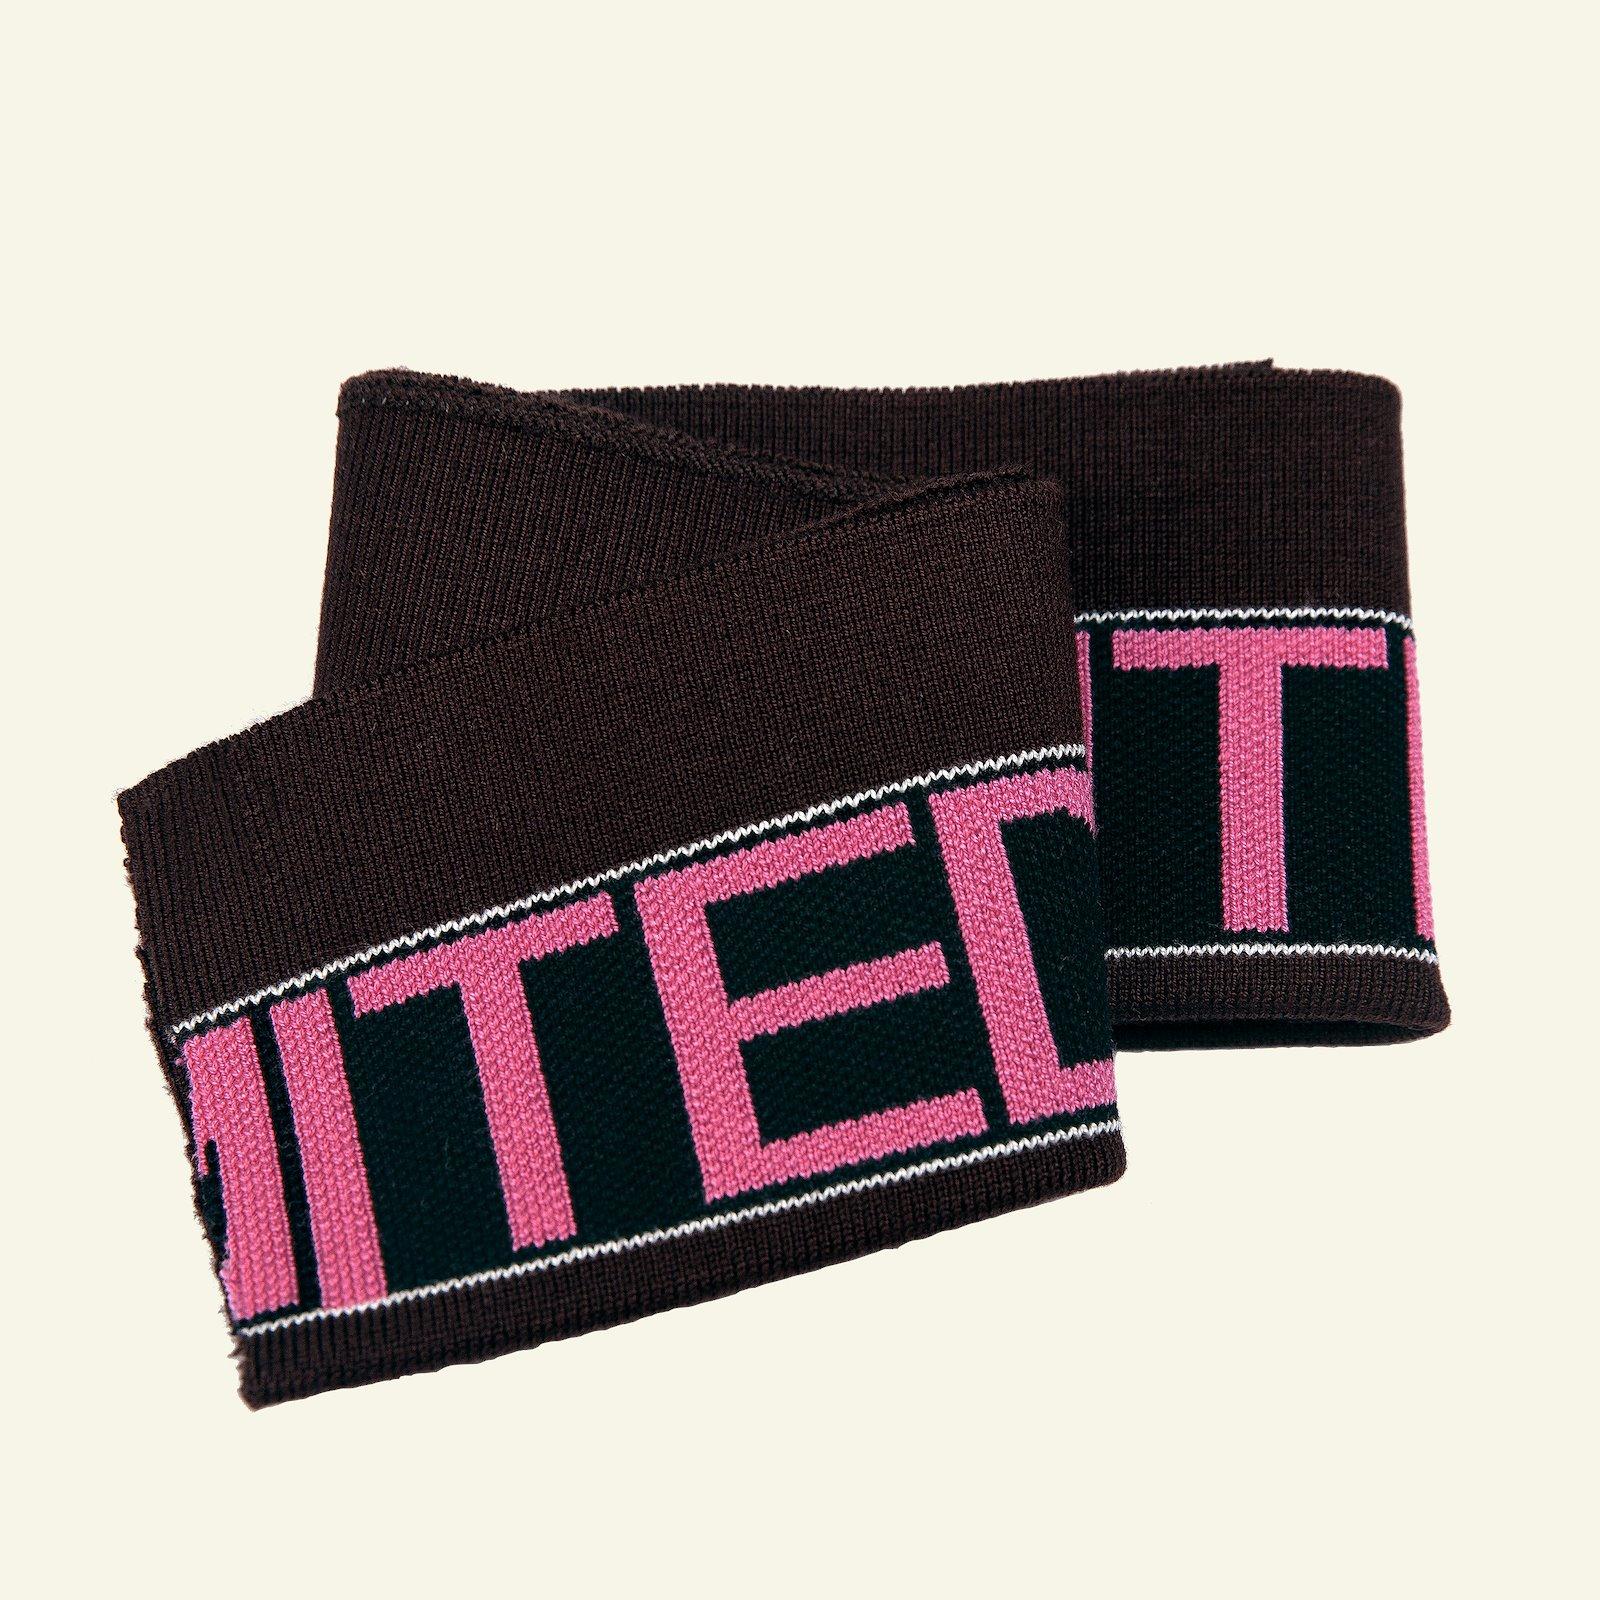 1x1 rib fold 13,5x100cm caramel/pink 1pc 96184_pack